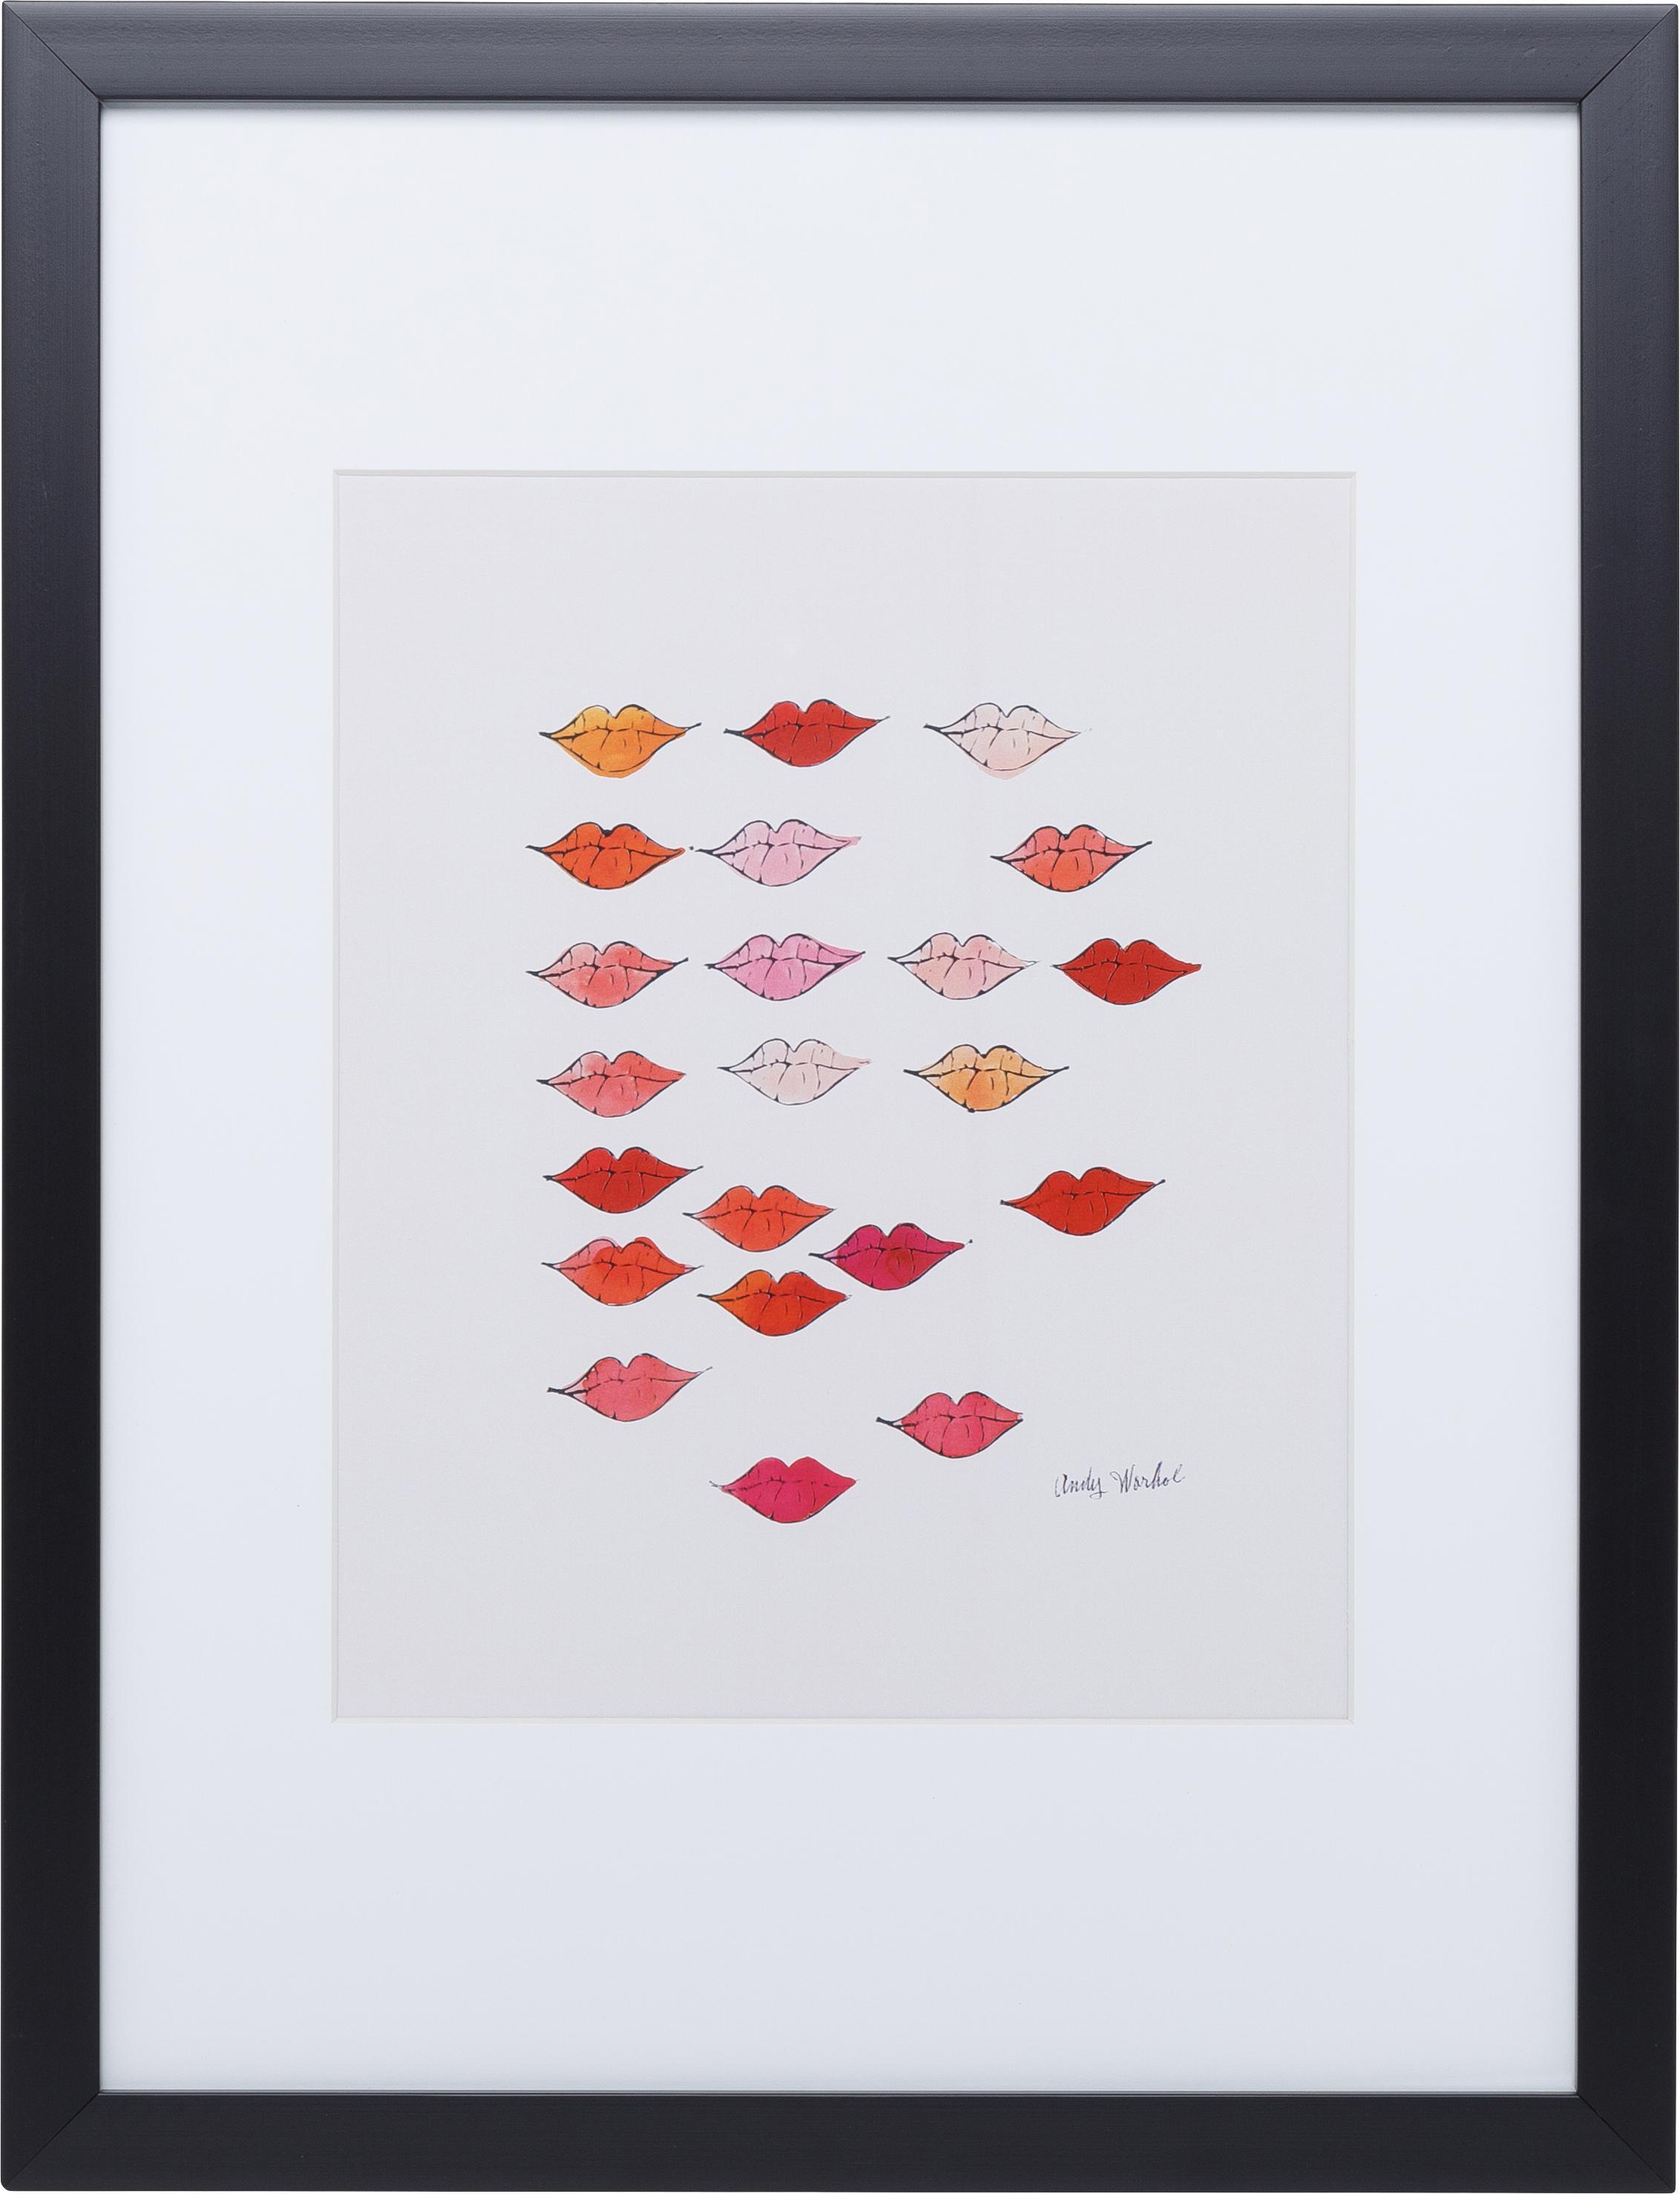 Ingelijste digitale print Kiss ''Andy Warhol Collection'', Afbeelding: digitale print, Frame: kunststof, Afbeelding: multicolour. Lijst: zwart, 30 x 40 cm